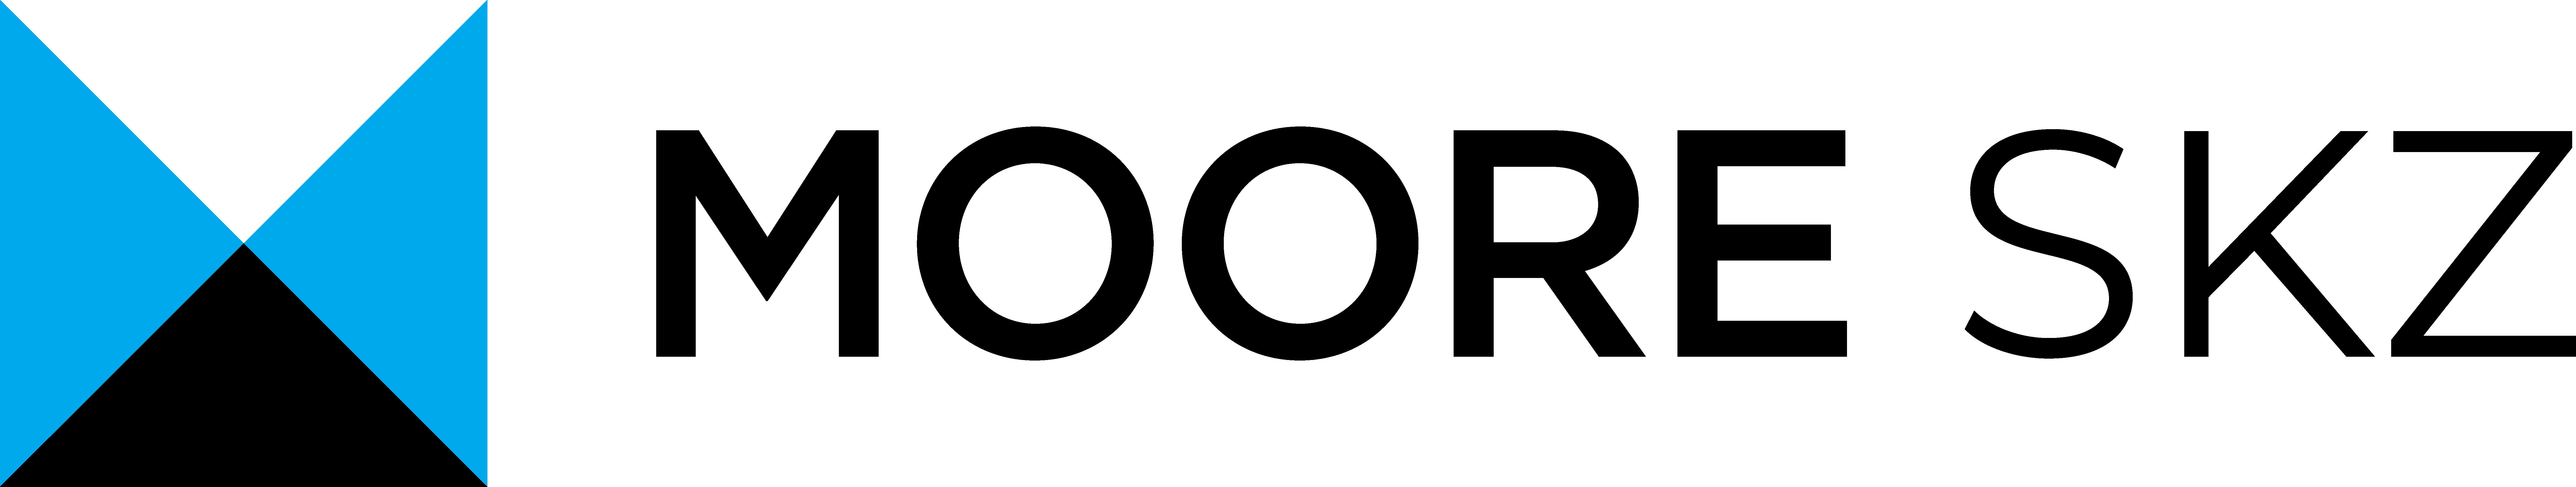 MOORE SKZ Logo